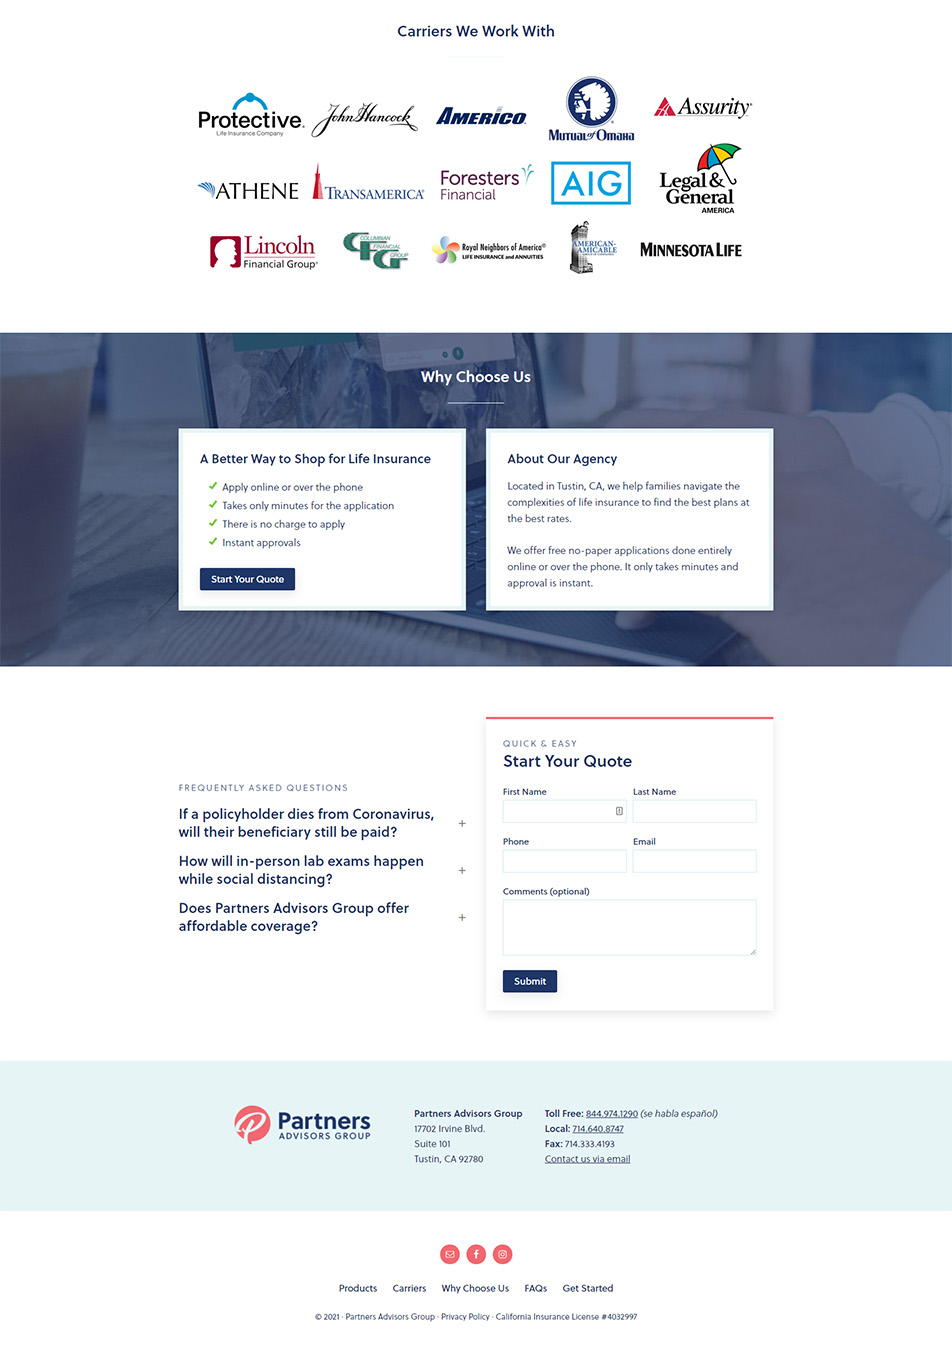 Partners Advisors Group website homepage